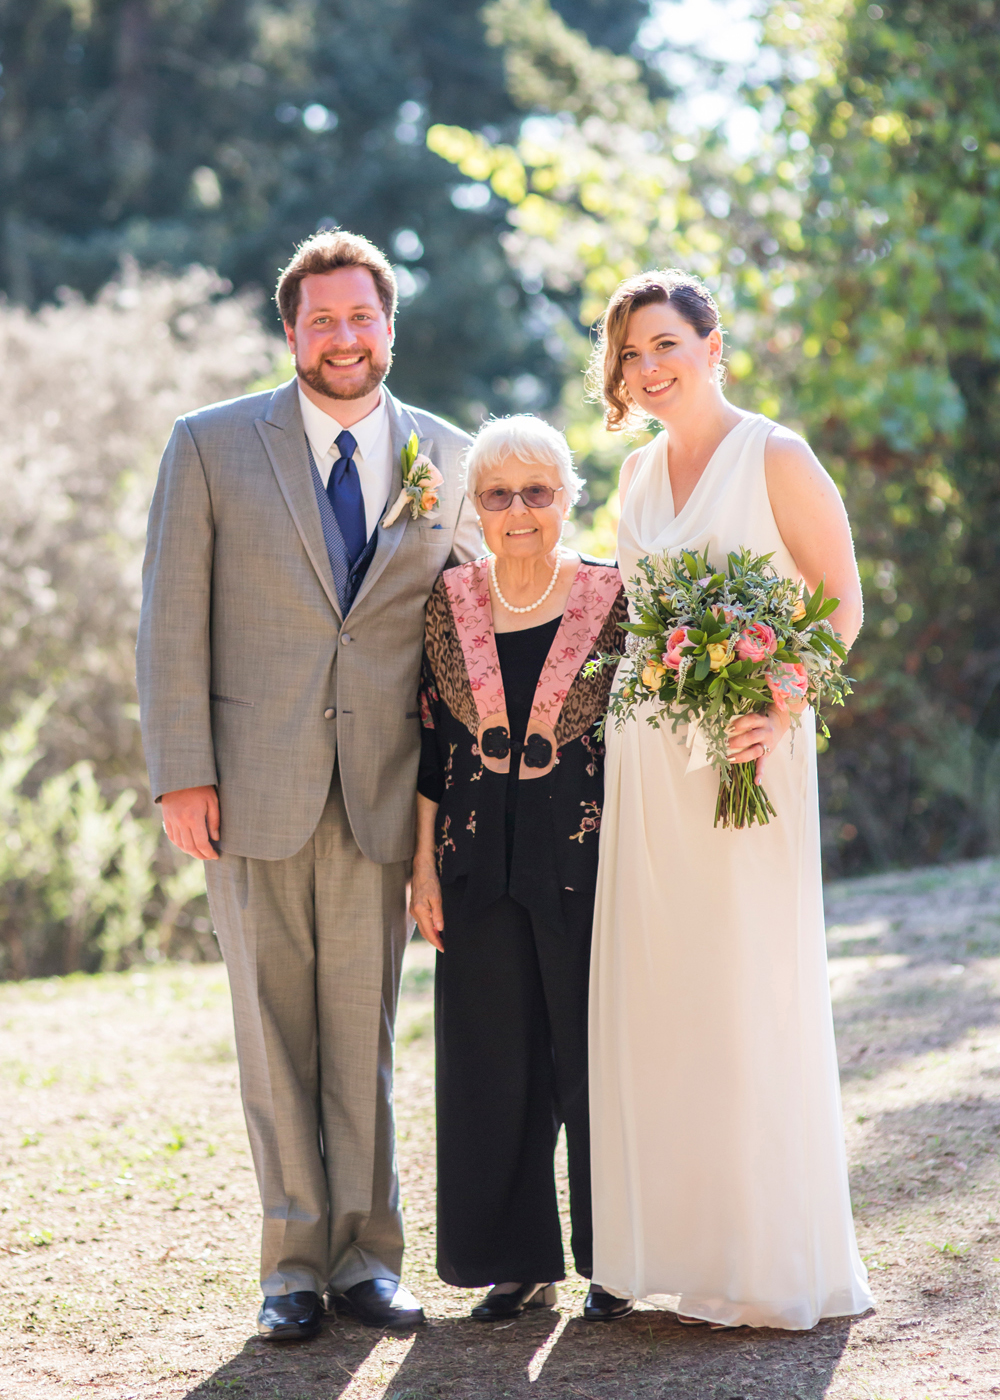 pema-osel-ling-santa-cruz-wedding-photography-lilouette-57.jpg